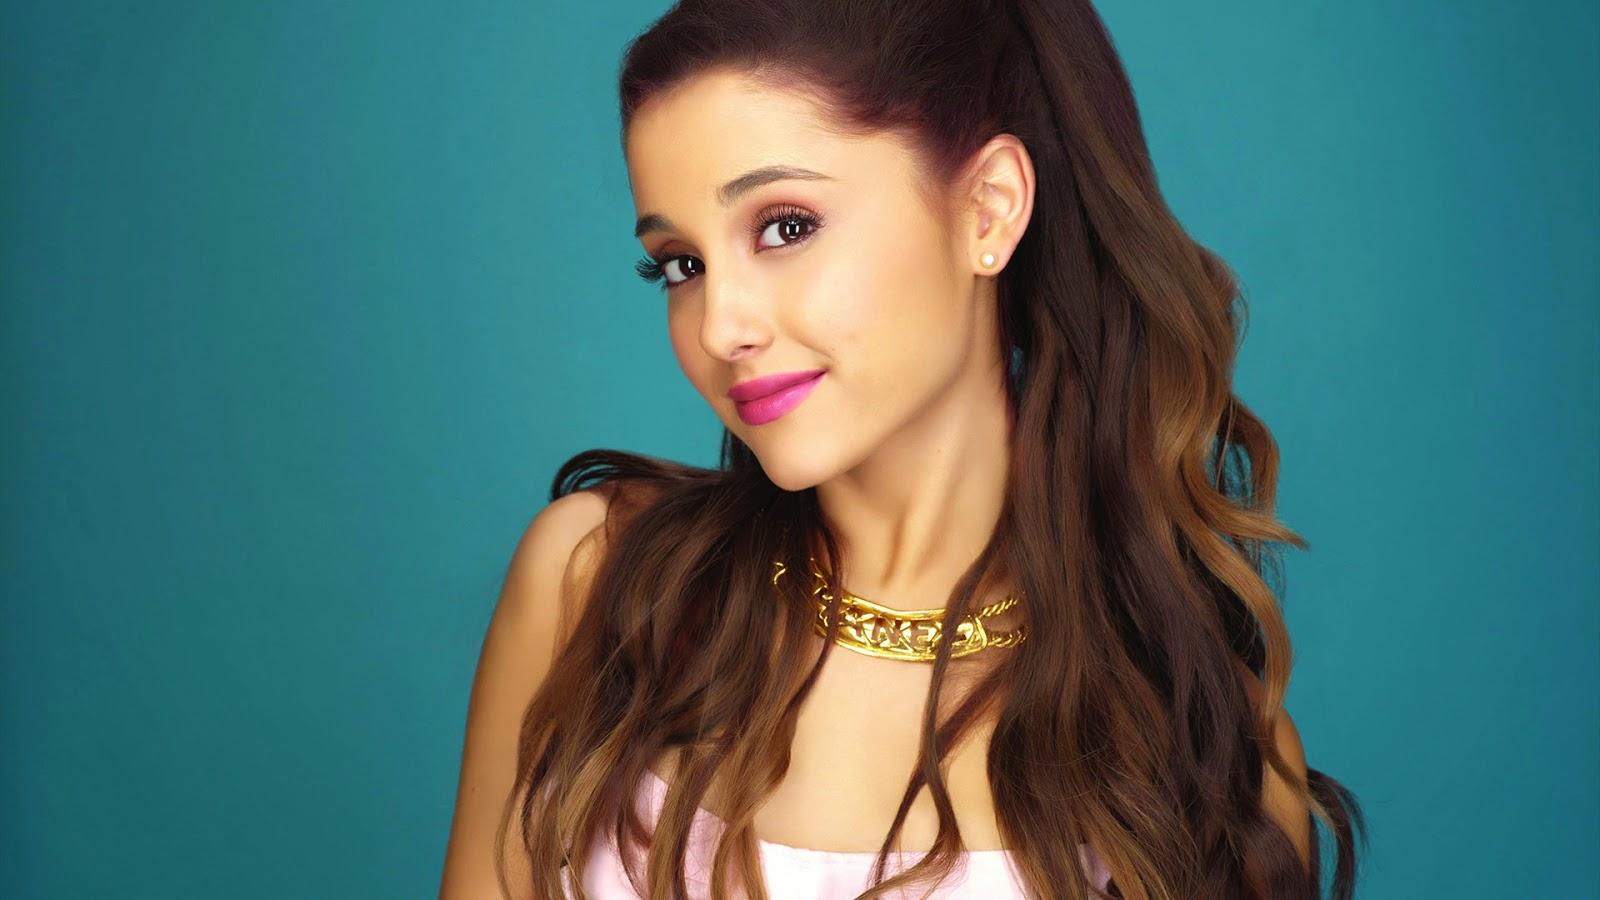 Ariana grande hd wallpaper the way celebrity wallpaper - Free wallpaper celebs ...